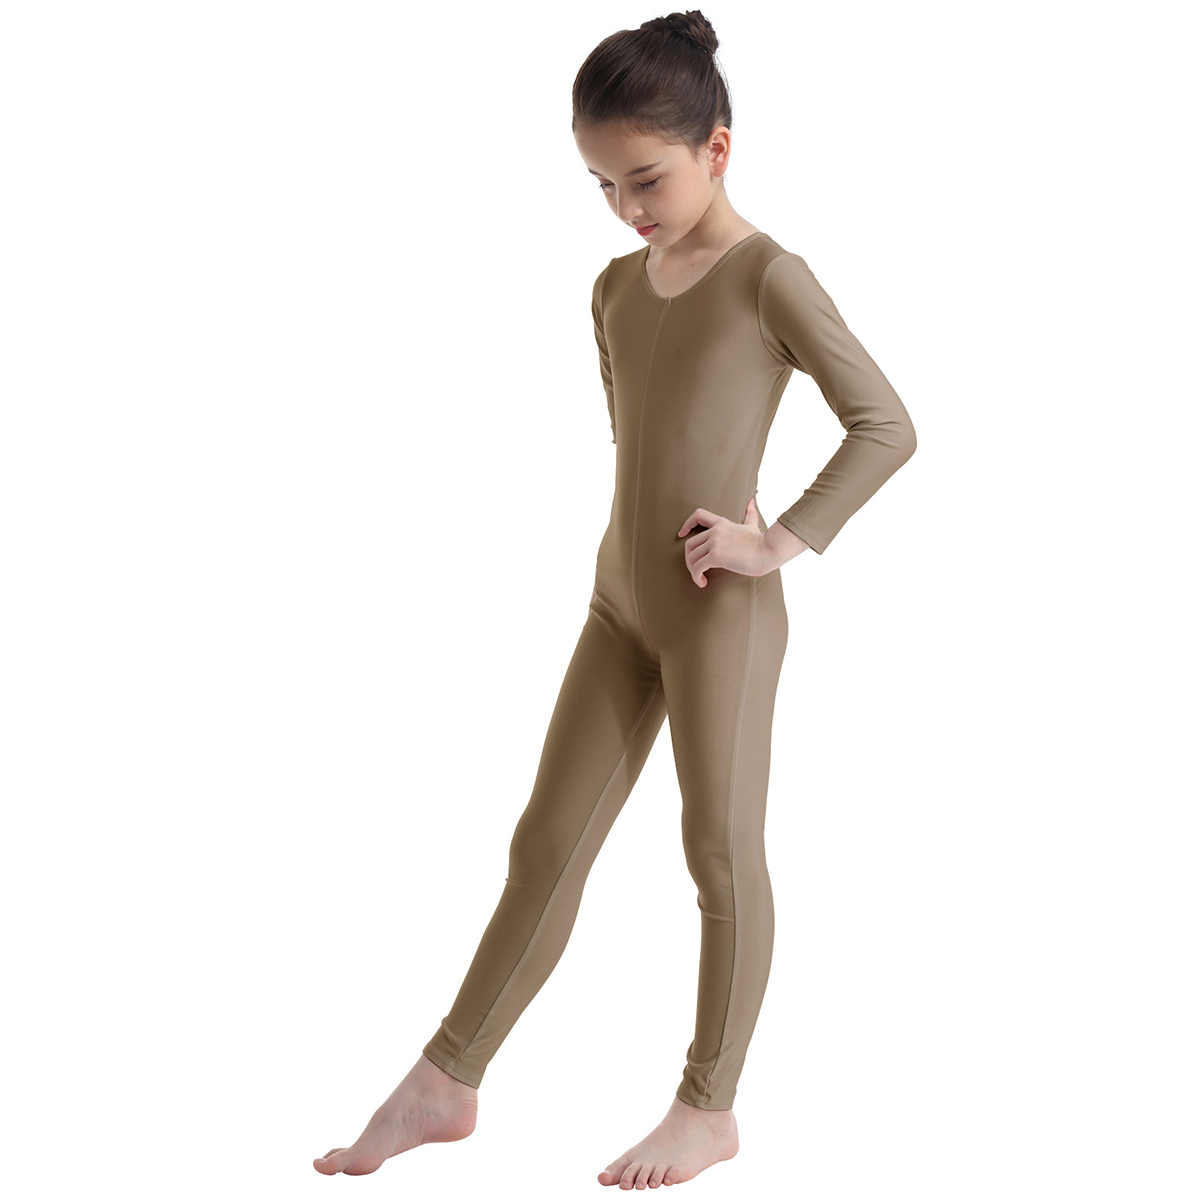 YOOJIA Kids Girls Lycra Spandex Long Sleeve Unitard Ballet Dance Leotard Bodysuit Catsuit Dancewear Costume